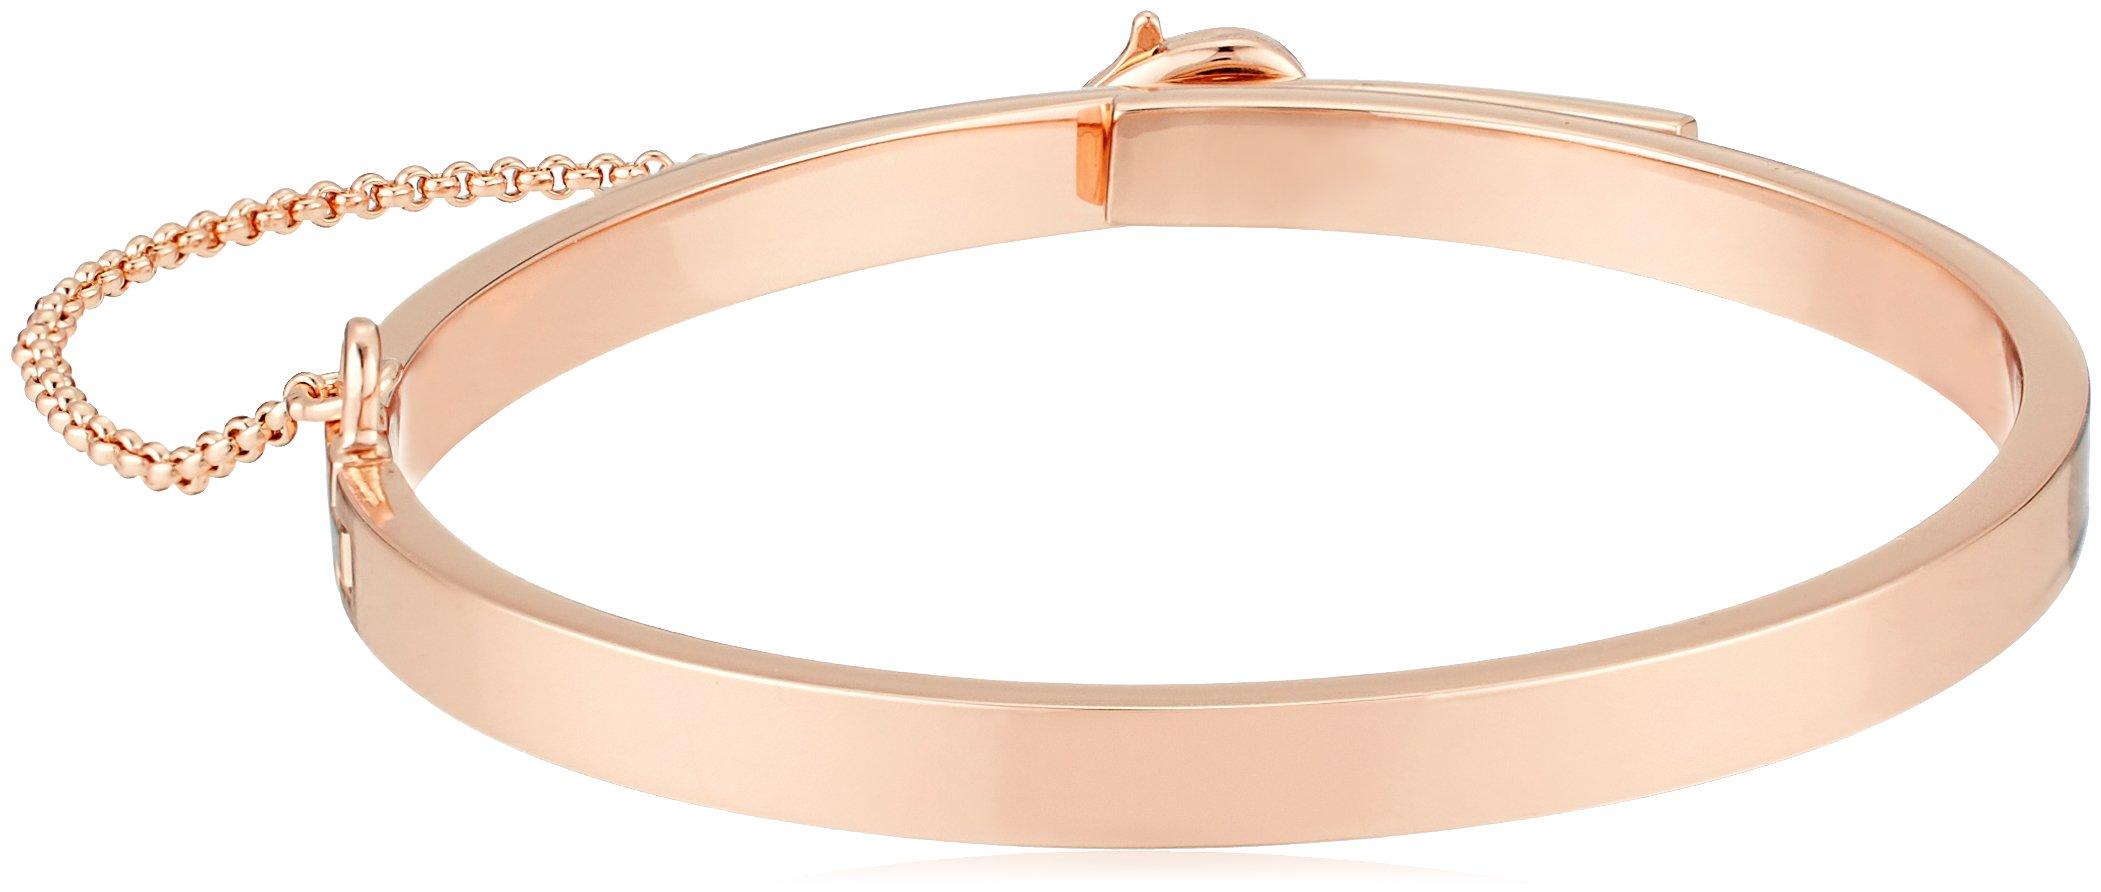 EDDIE BORGO Extra Thin Safety Chain Rose Gold Cuff Bracelet